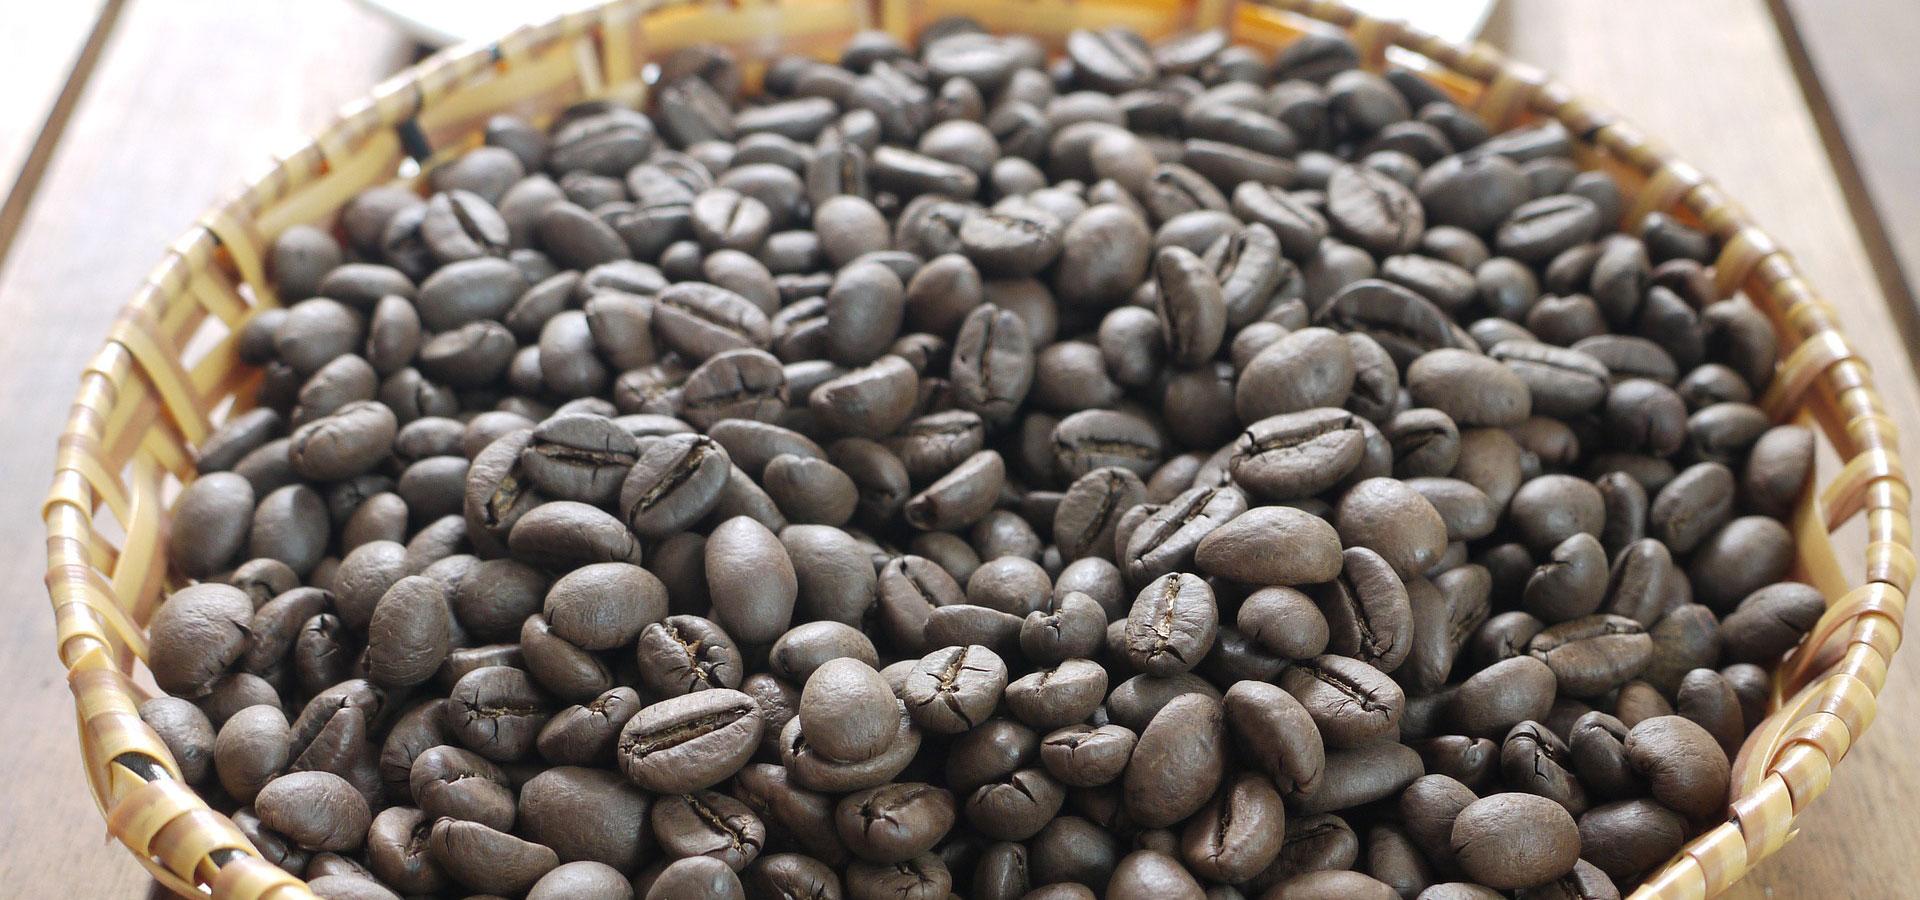 robusta-kaffee robusta kaffee angebaut wie schmeckt robusta kaffee kaffee-held.de